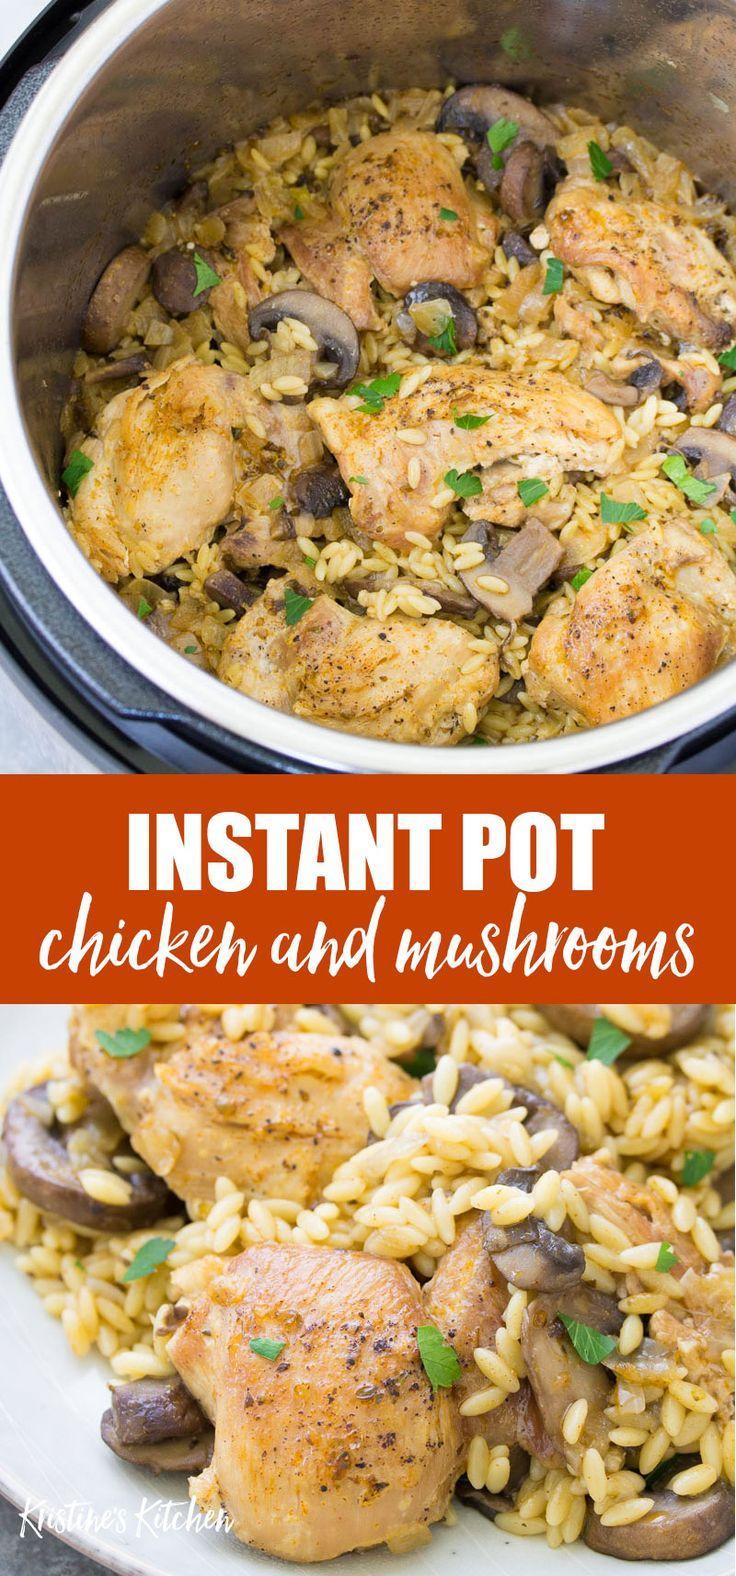 Instant Pot Chicken and Mushrooms -   19 healthy instant pot recipes chicken easy ideas